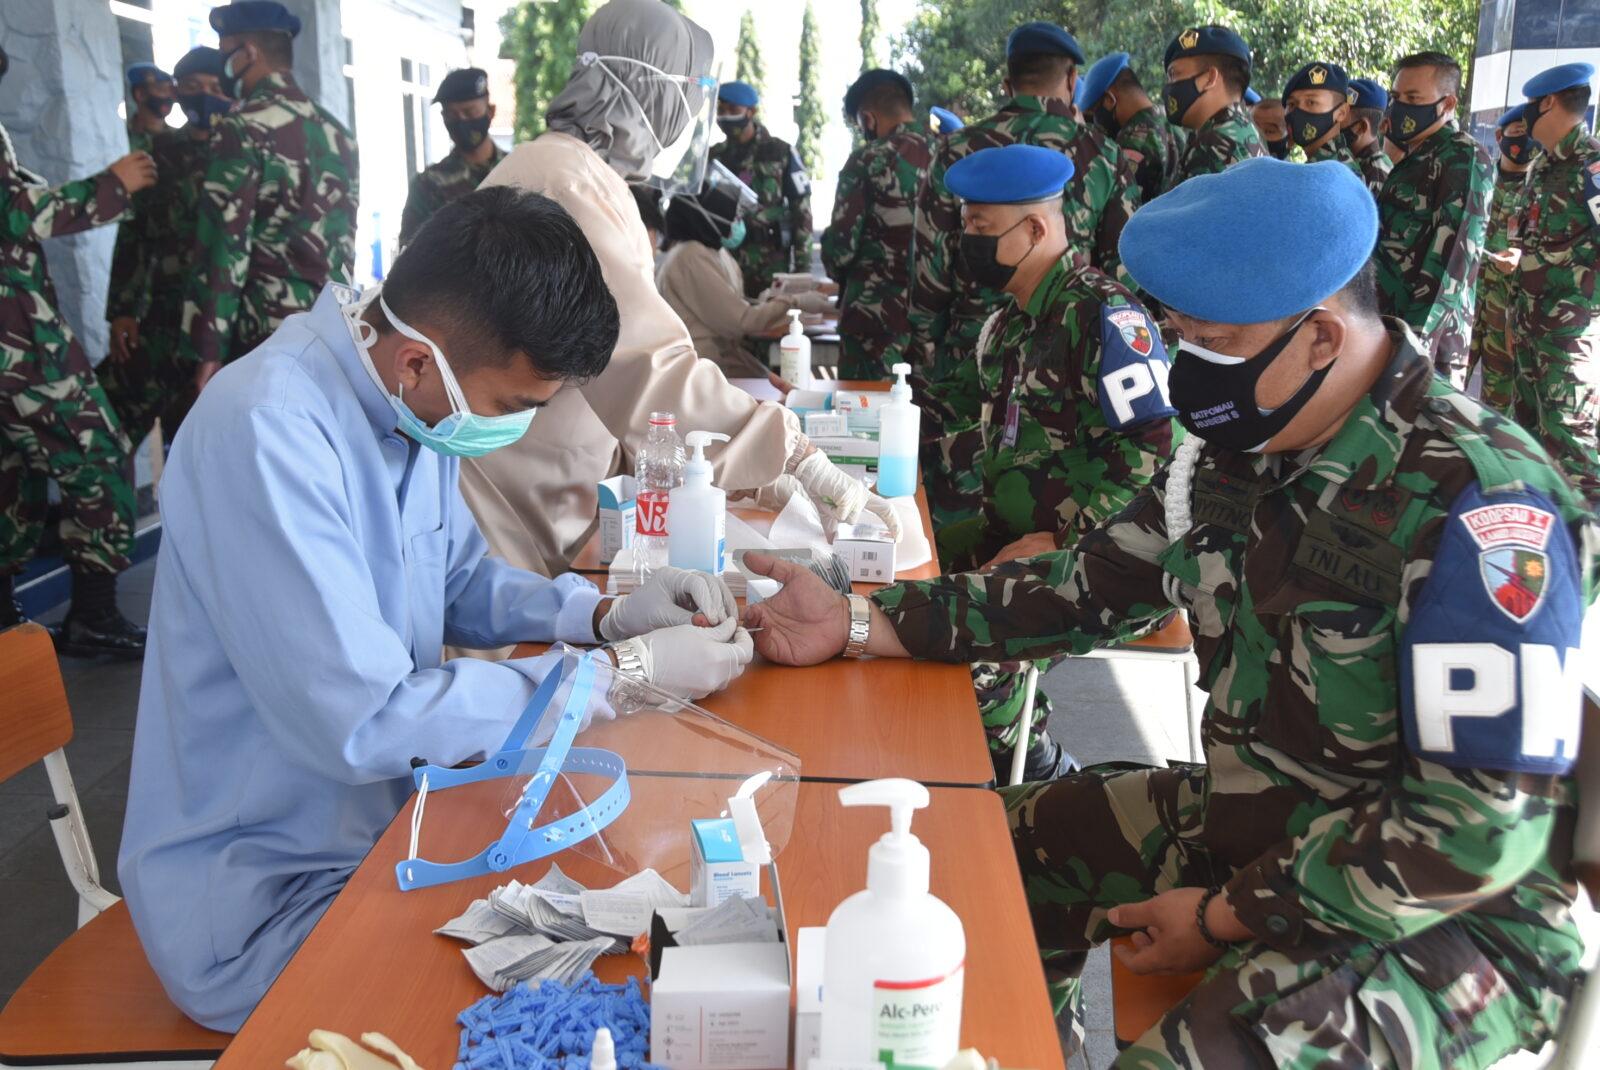 Antisipasi Penularan Covid-19, Seluruh Personel Lanud Husein Sastranegara Kembali Rafid Test.